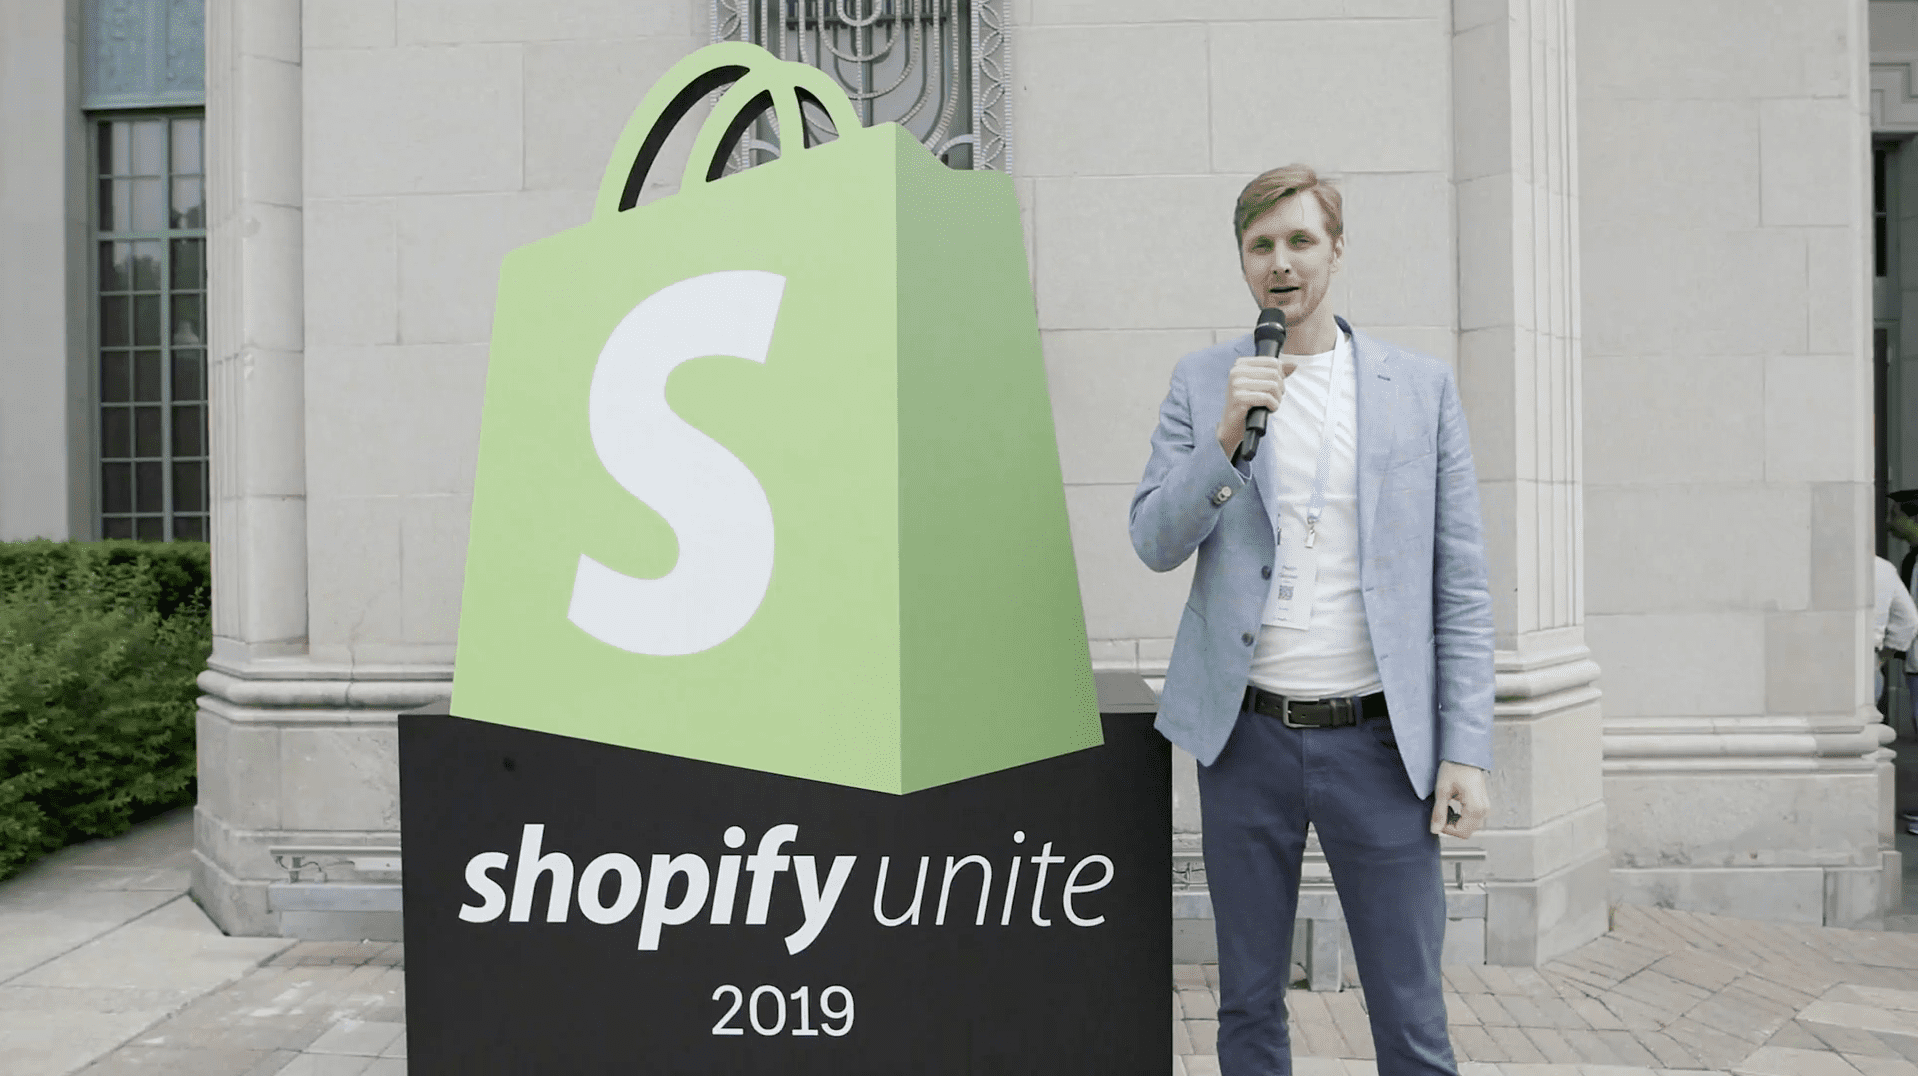 Pepijn Gooiker at Shopify Unite 2019